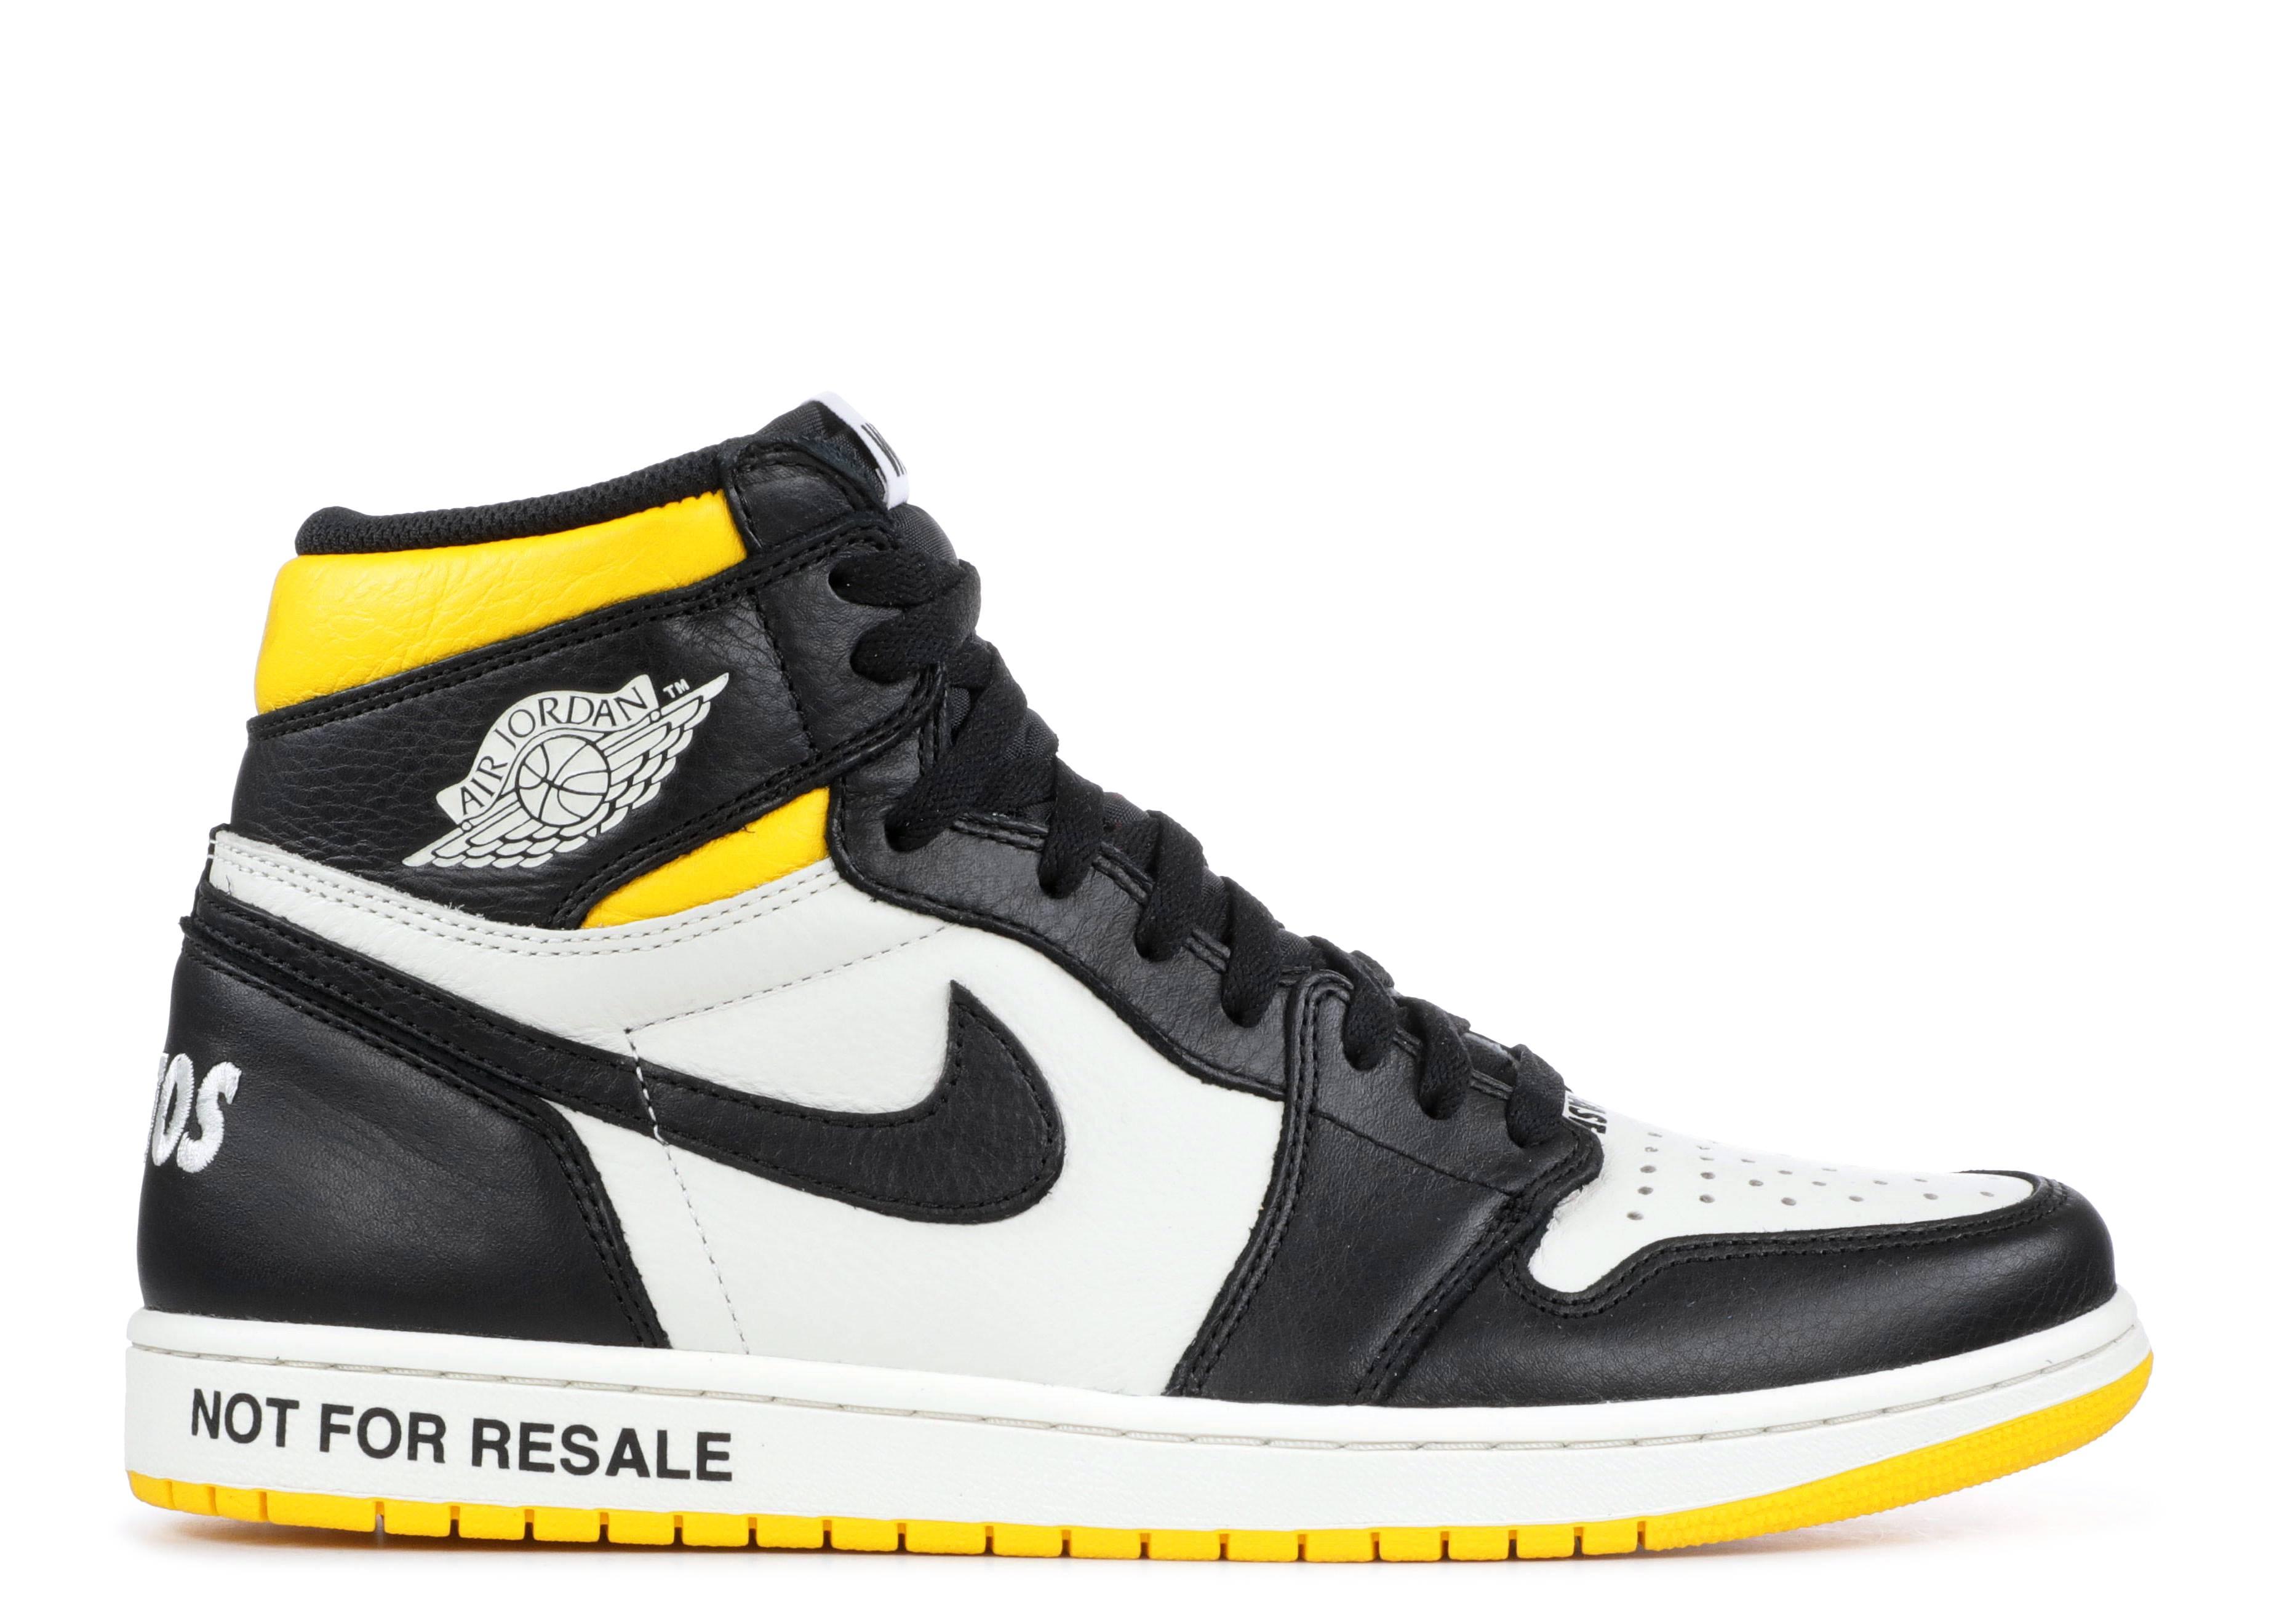 sale retailer 307a0 7890f Air Jordan 1 Retro High Og Nrg